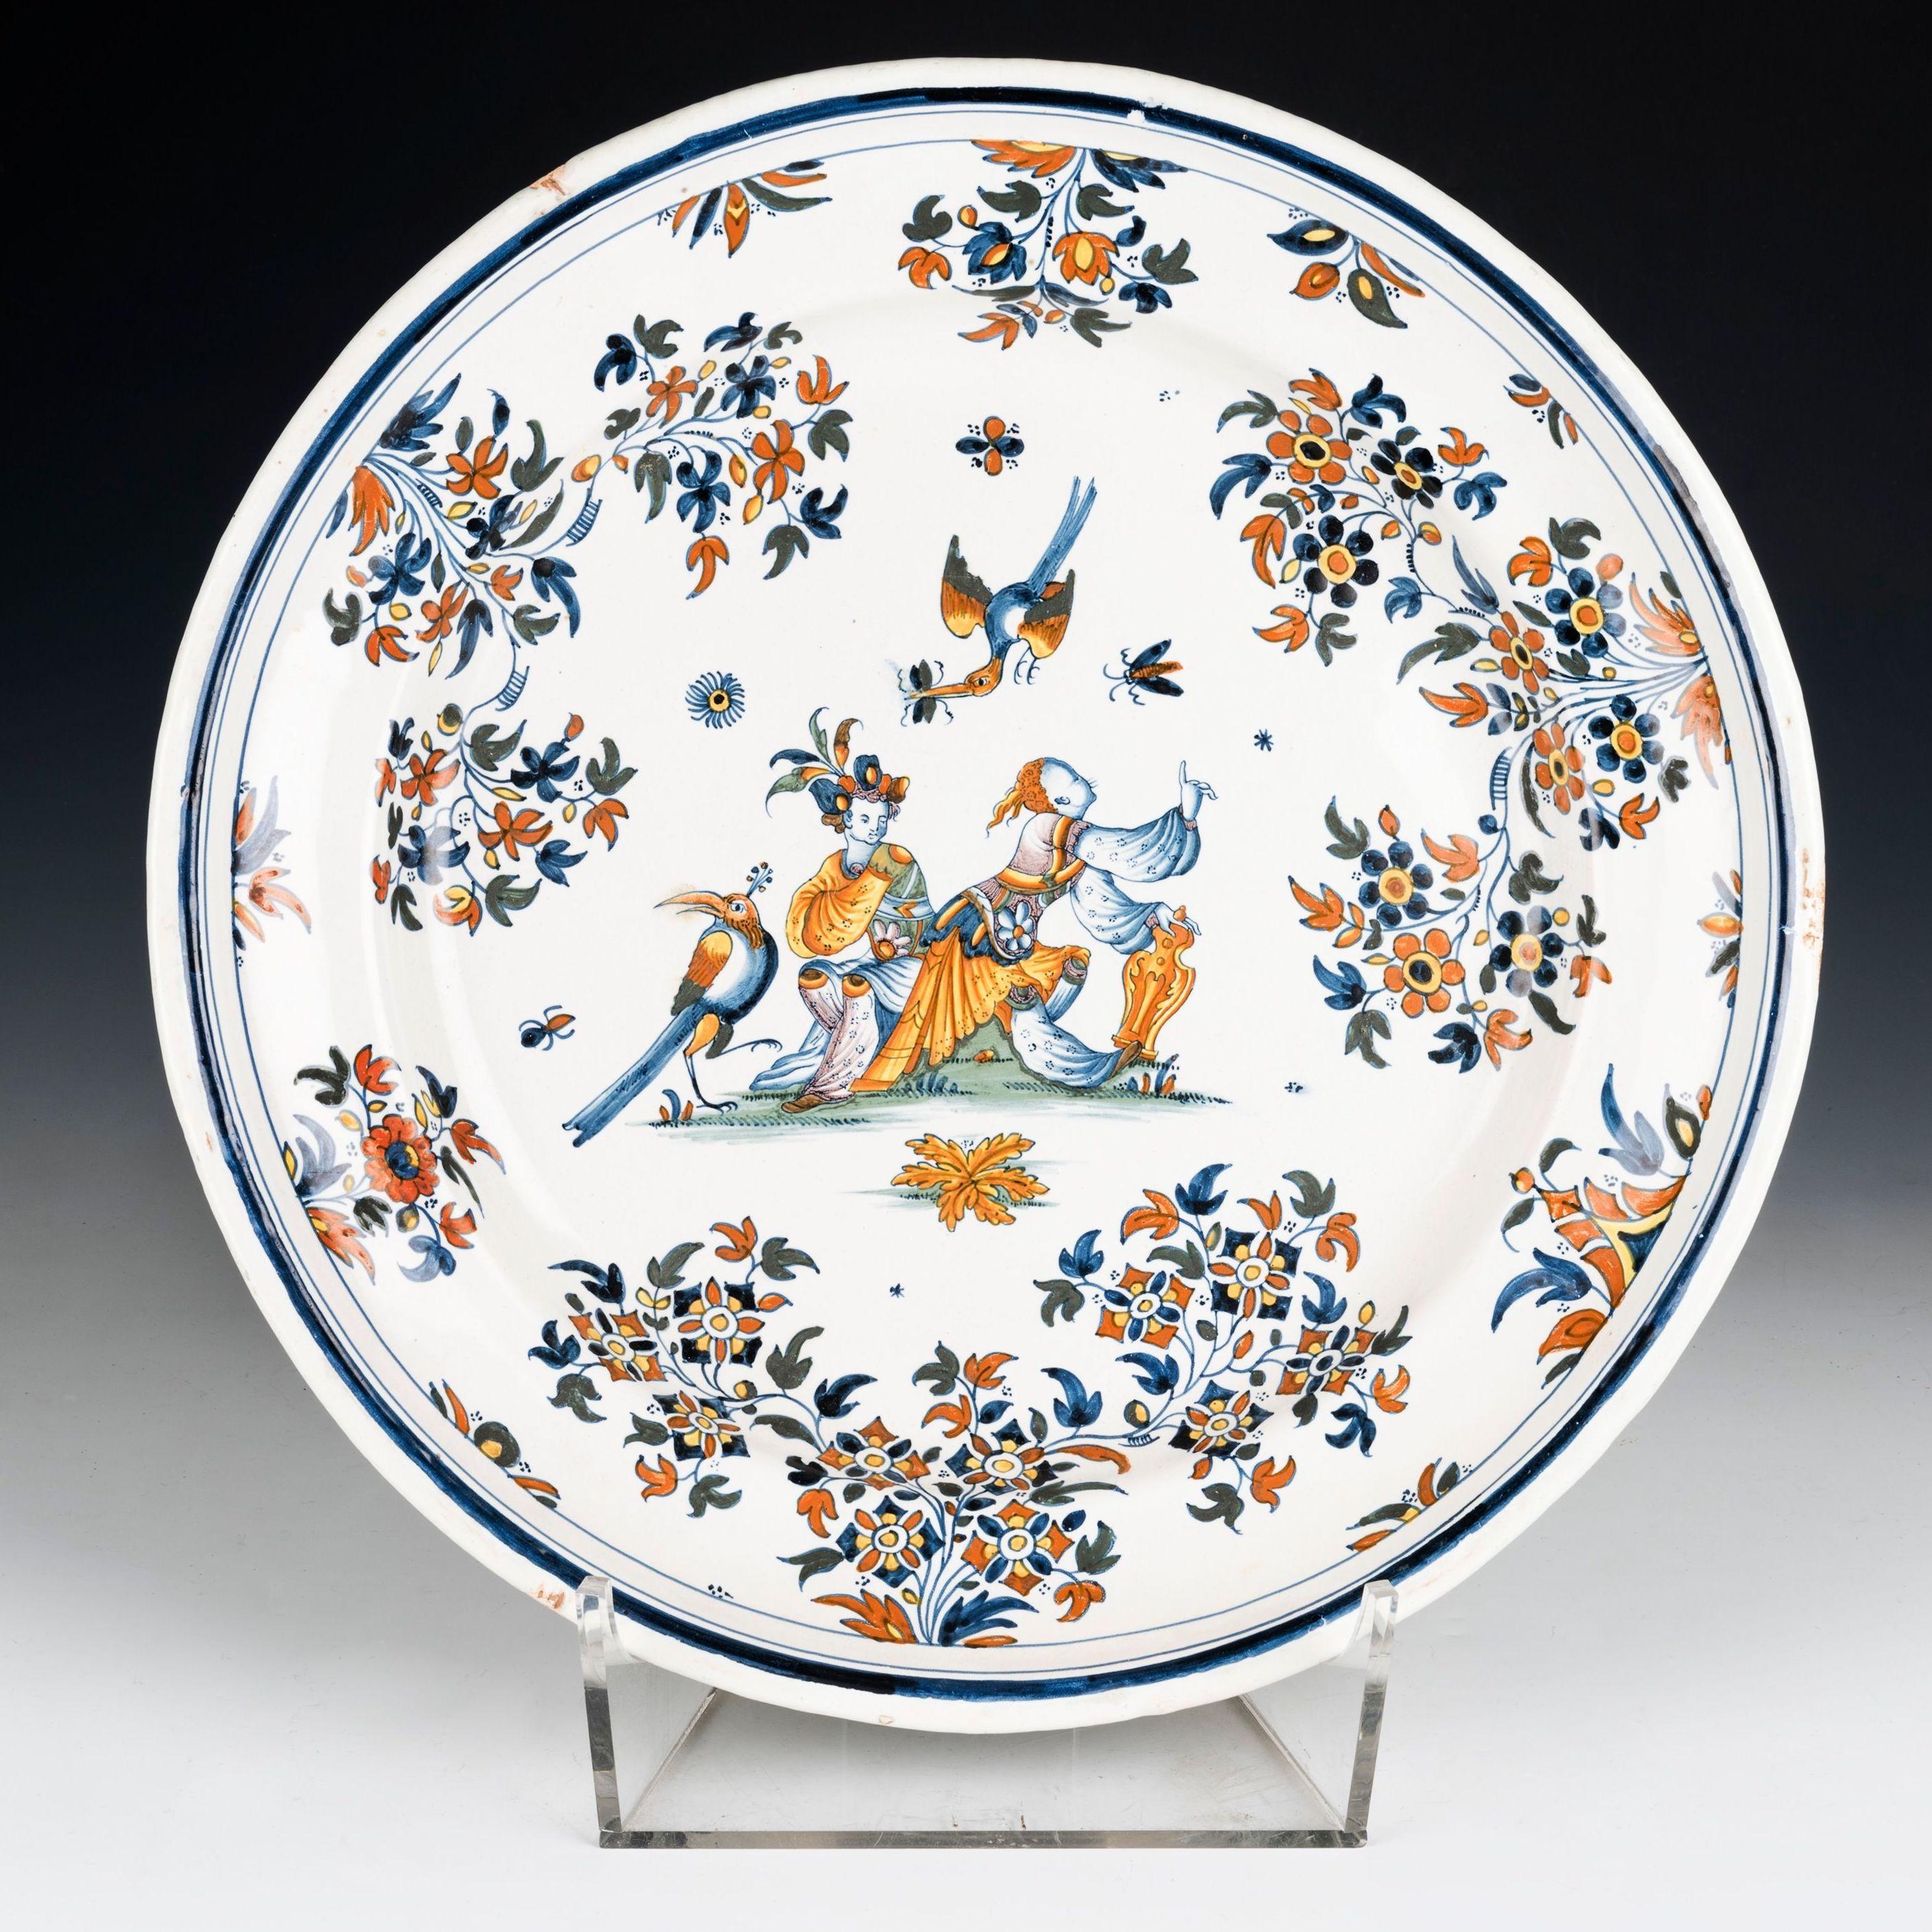 Plato de loza de Alcora: Catálogo de Goya Subastas